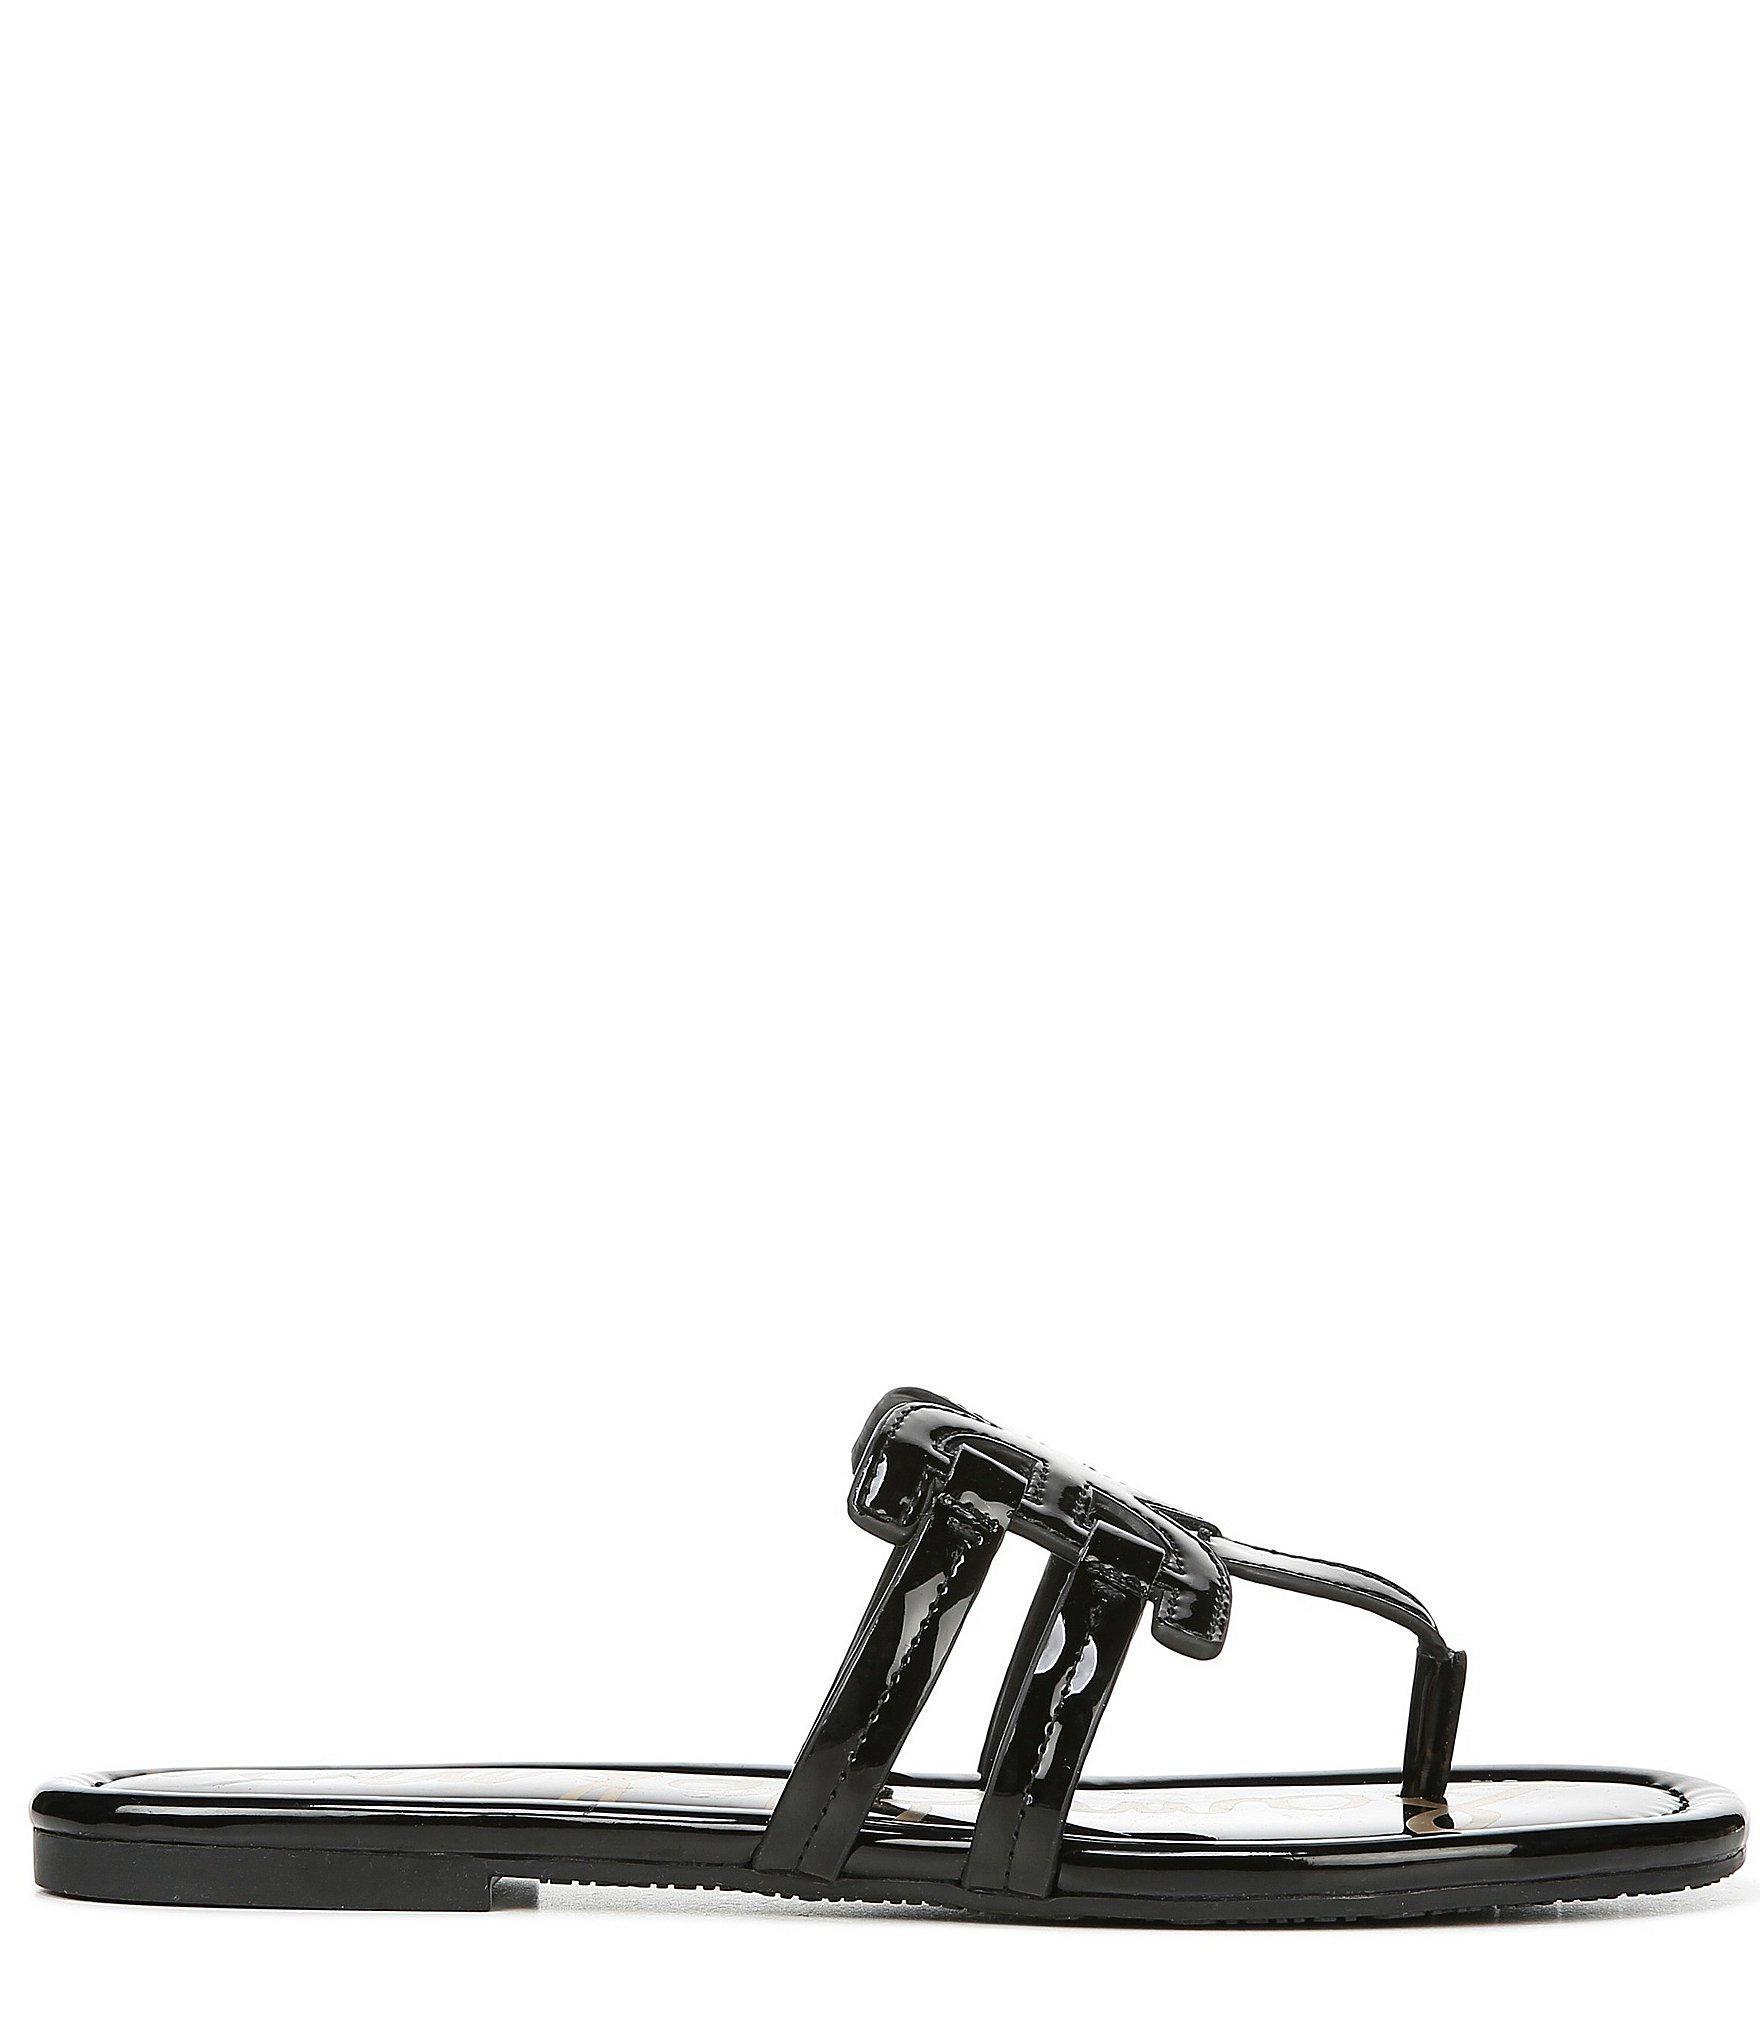 05f84e316 Sam Edelman - Black Cara Patent Double E Sandals - Lyst. View fullscreen